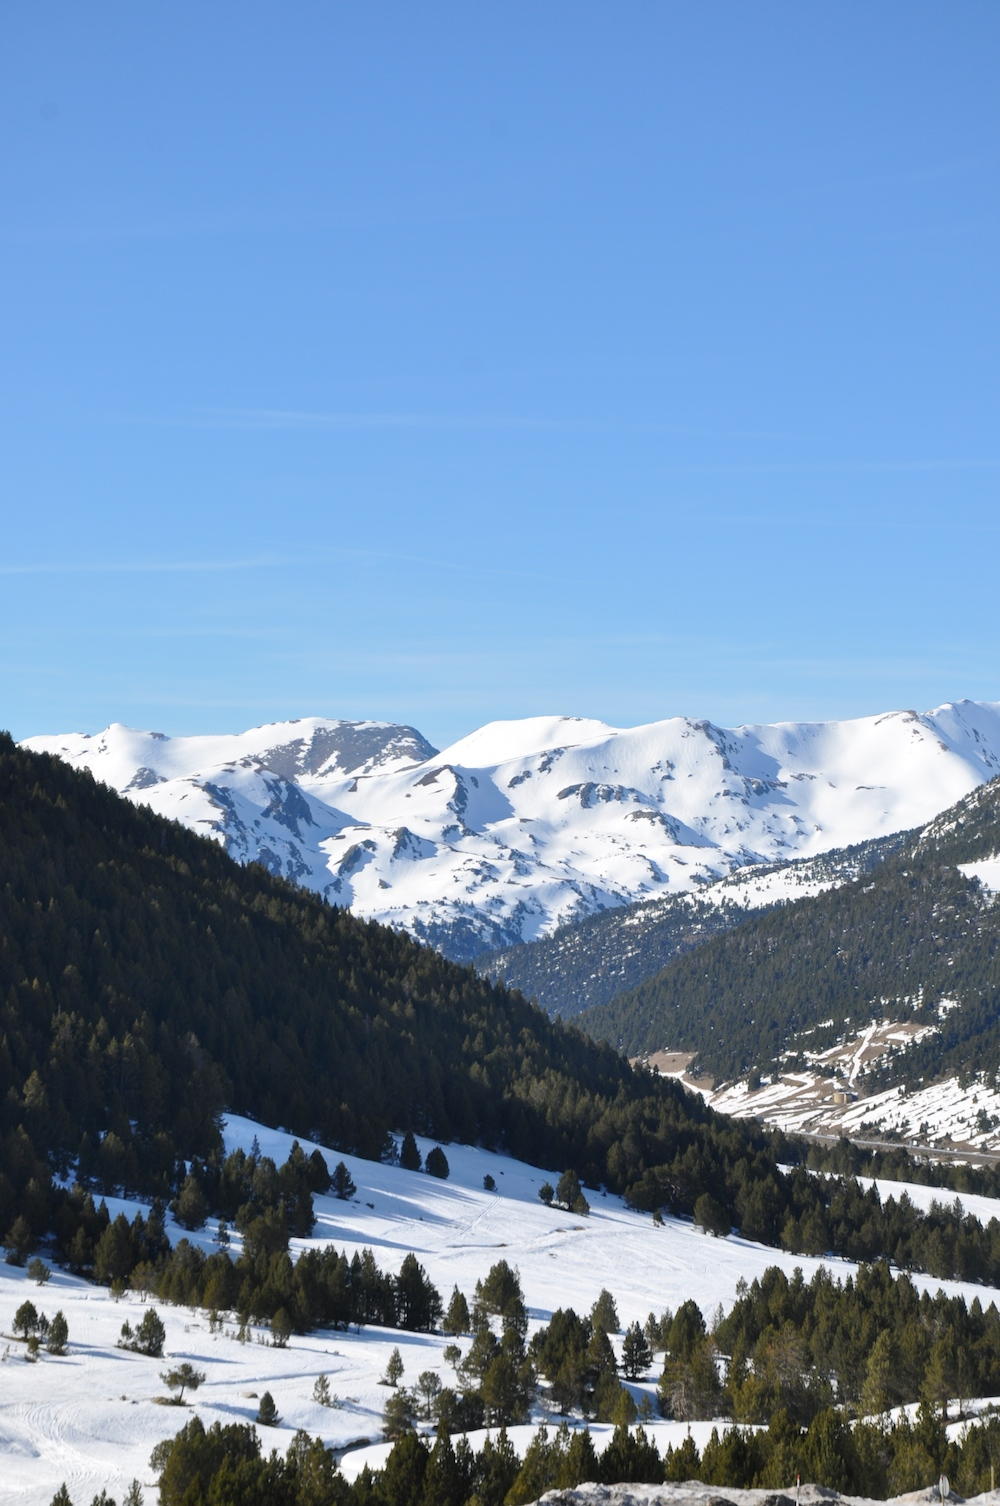 Andorra_grau_roig_snow_mountains